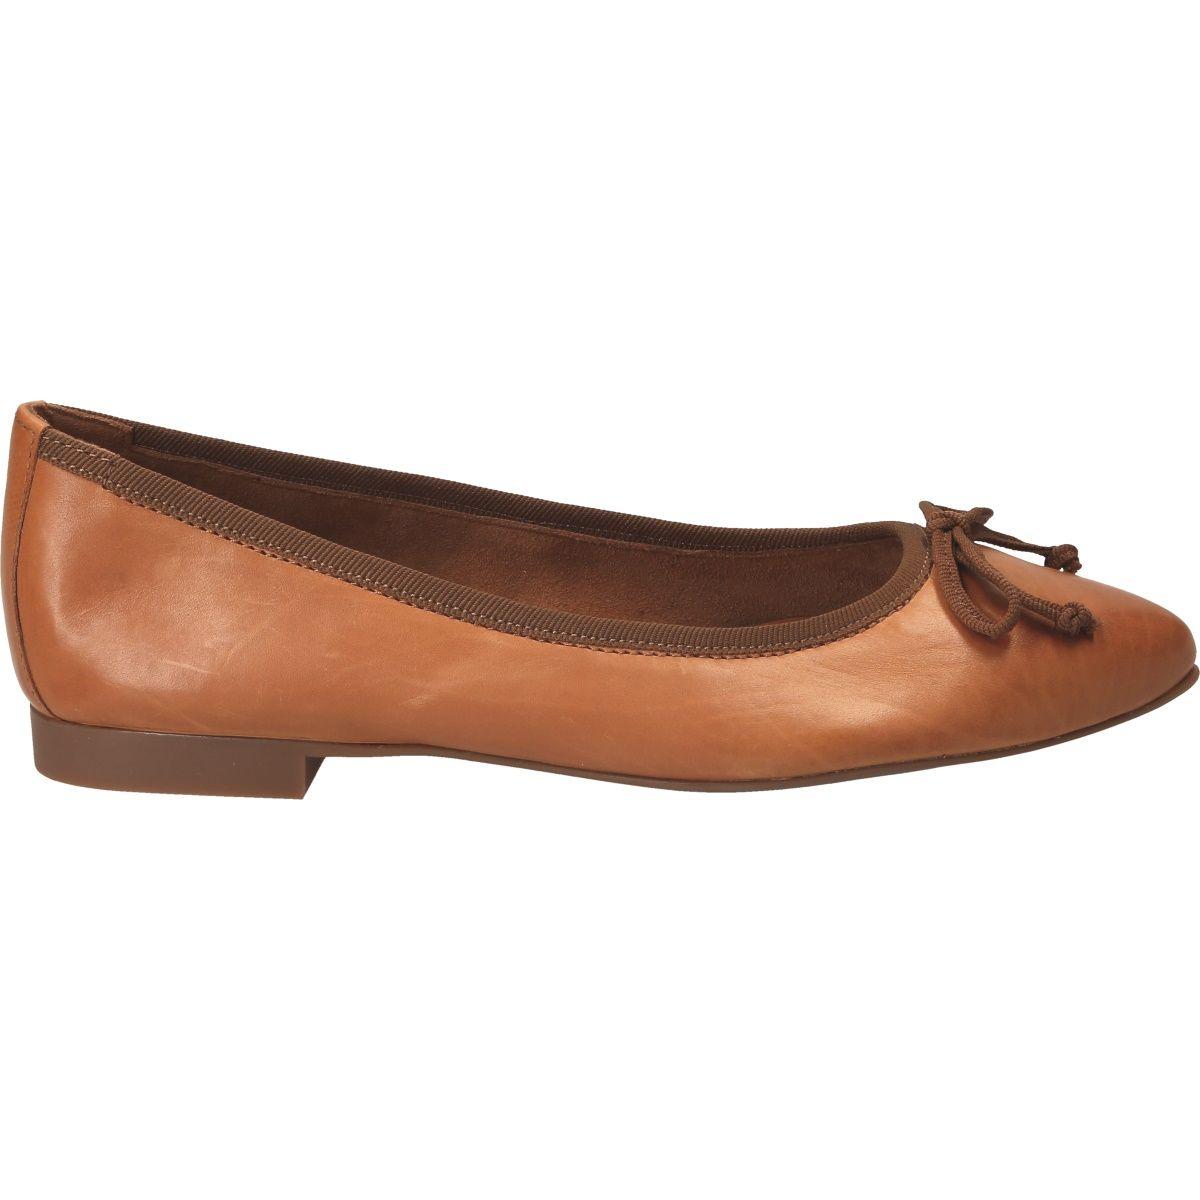 Ballerinas in brown 2480 114 Buy in Paul Green Online Shop